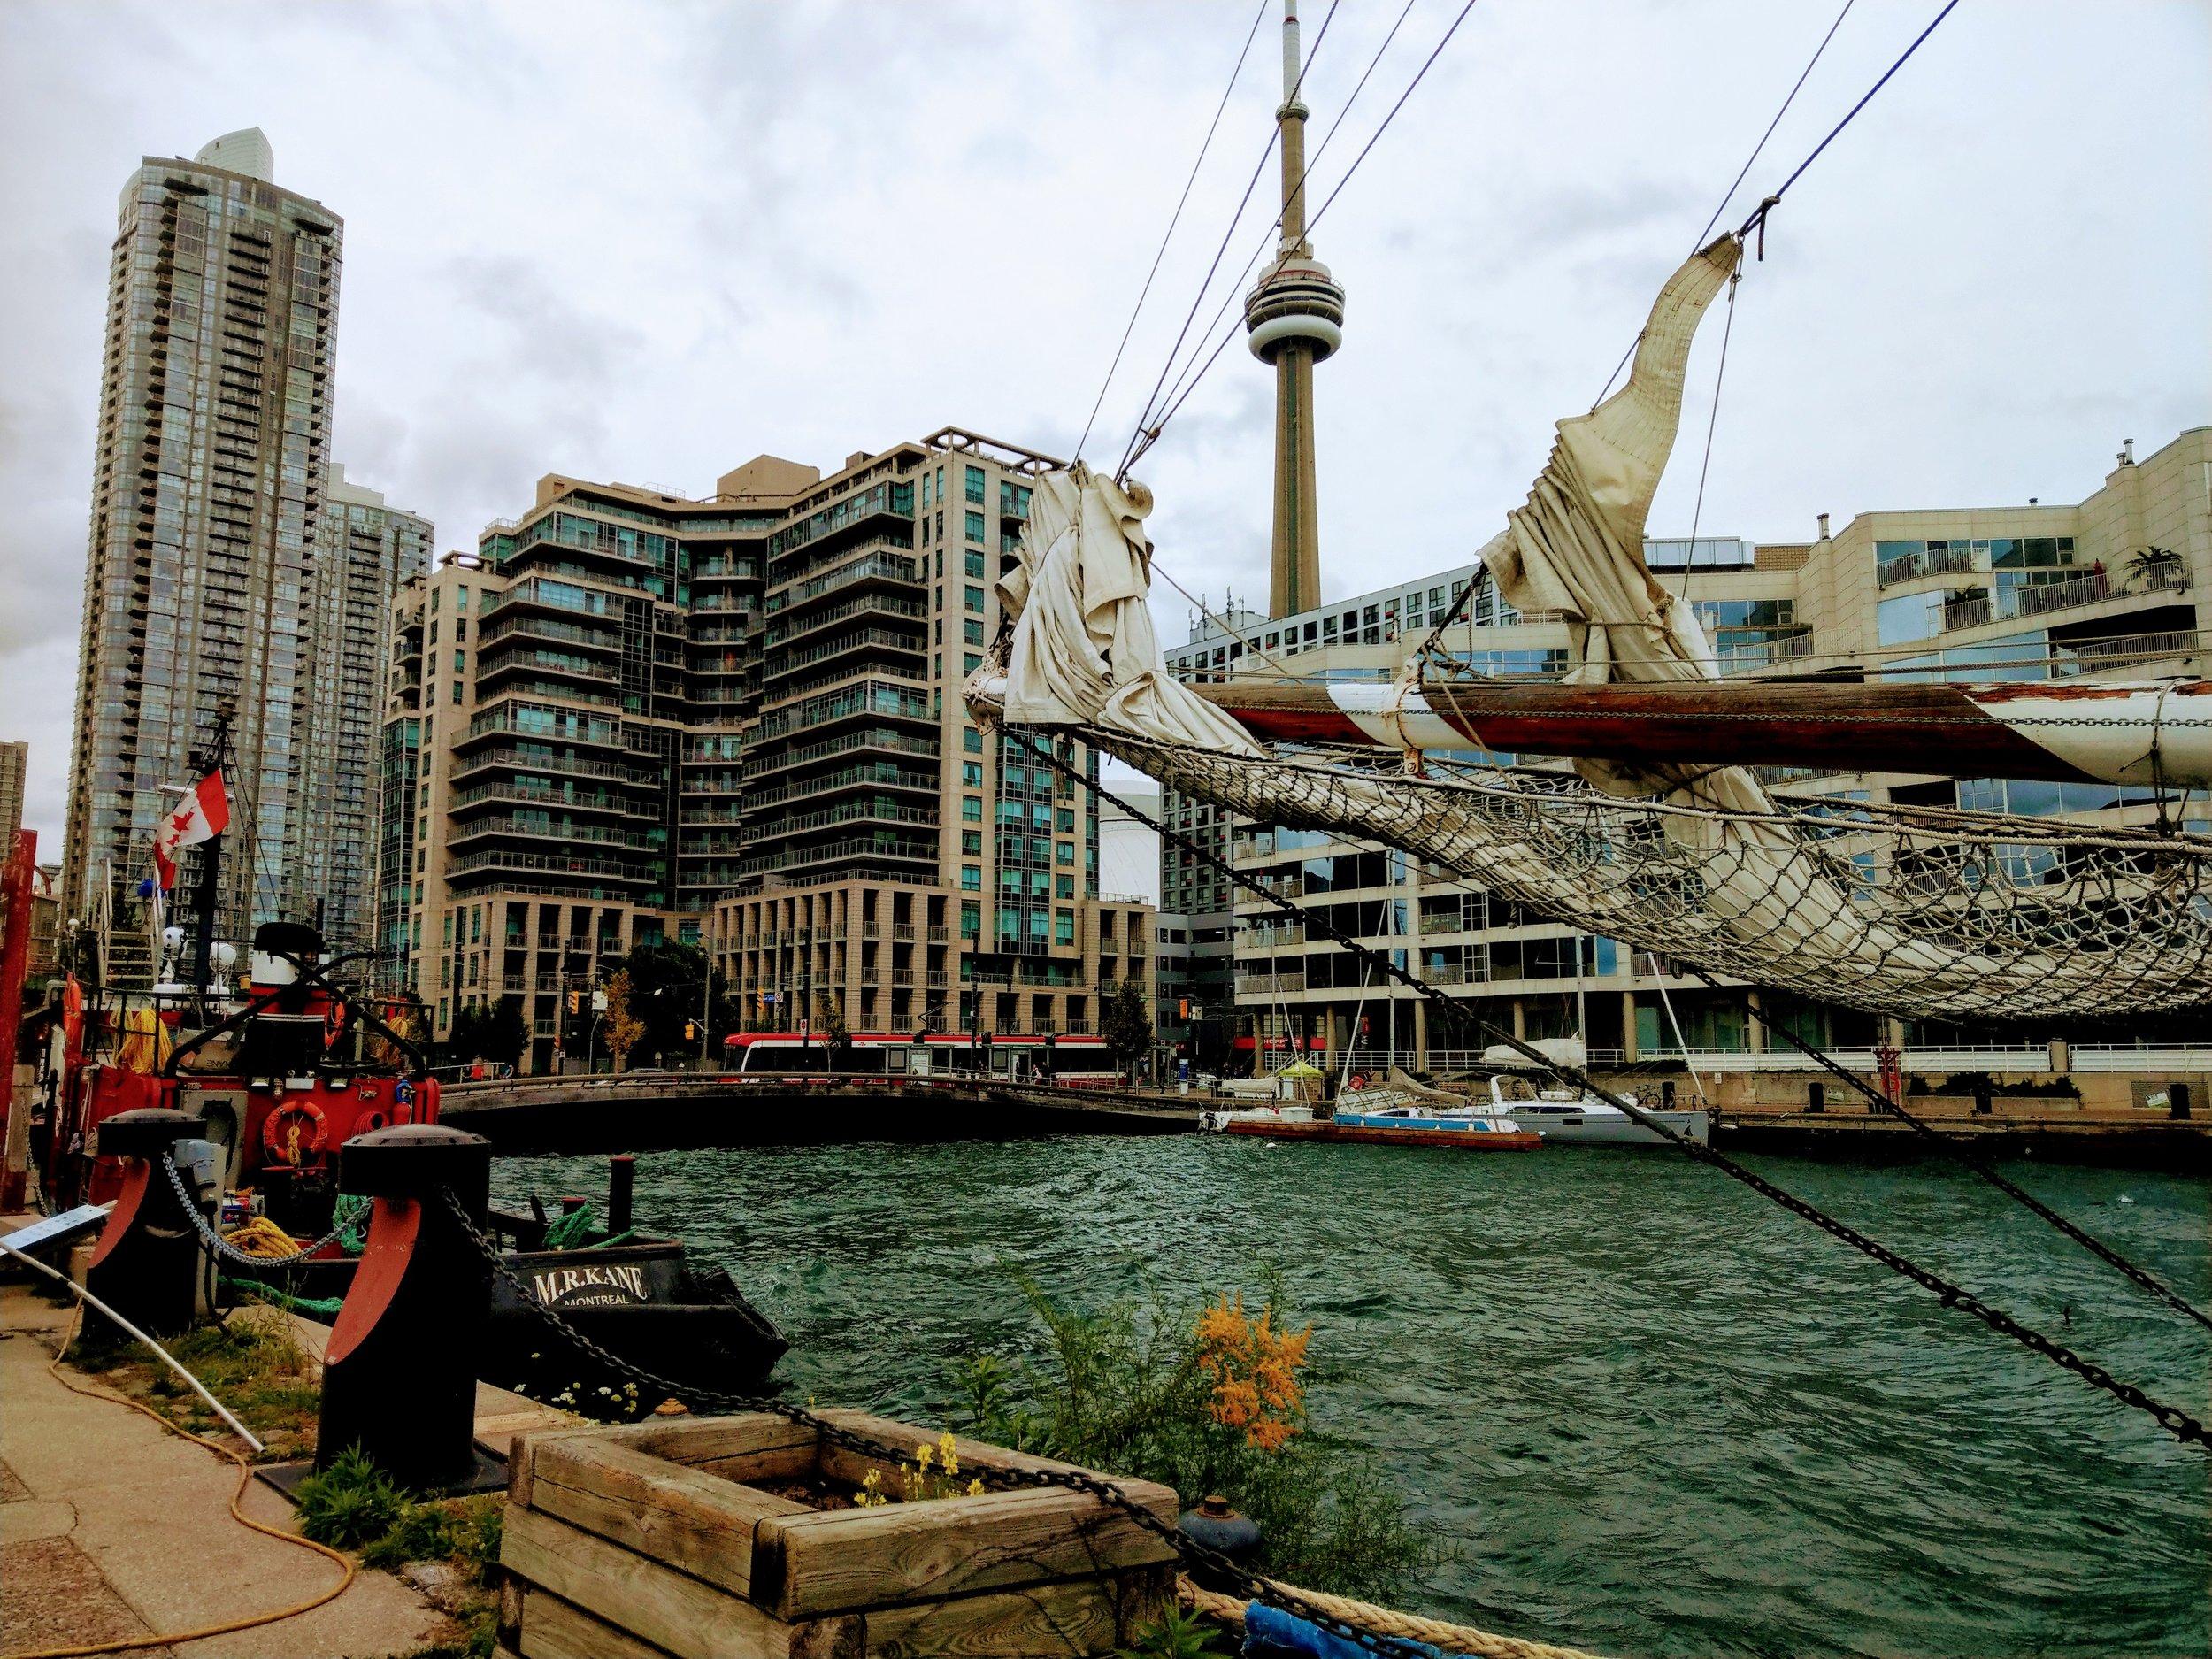 The Harbourfront, Toronto